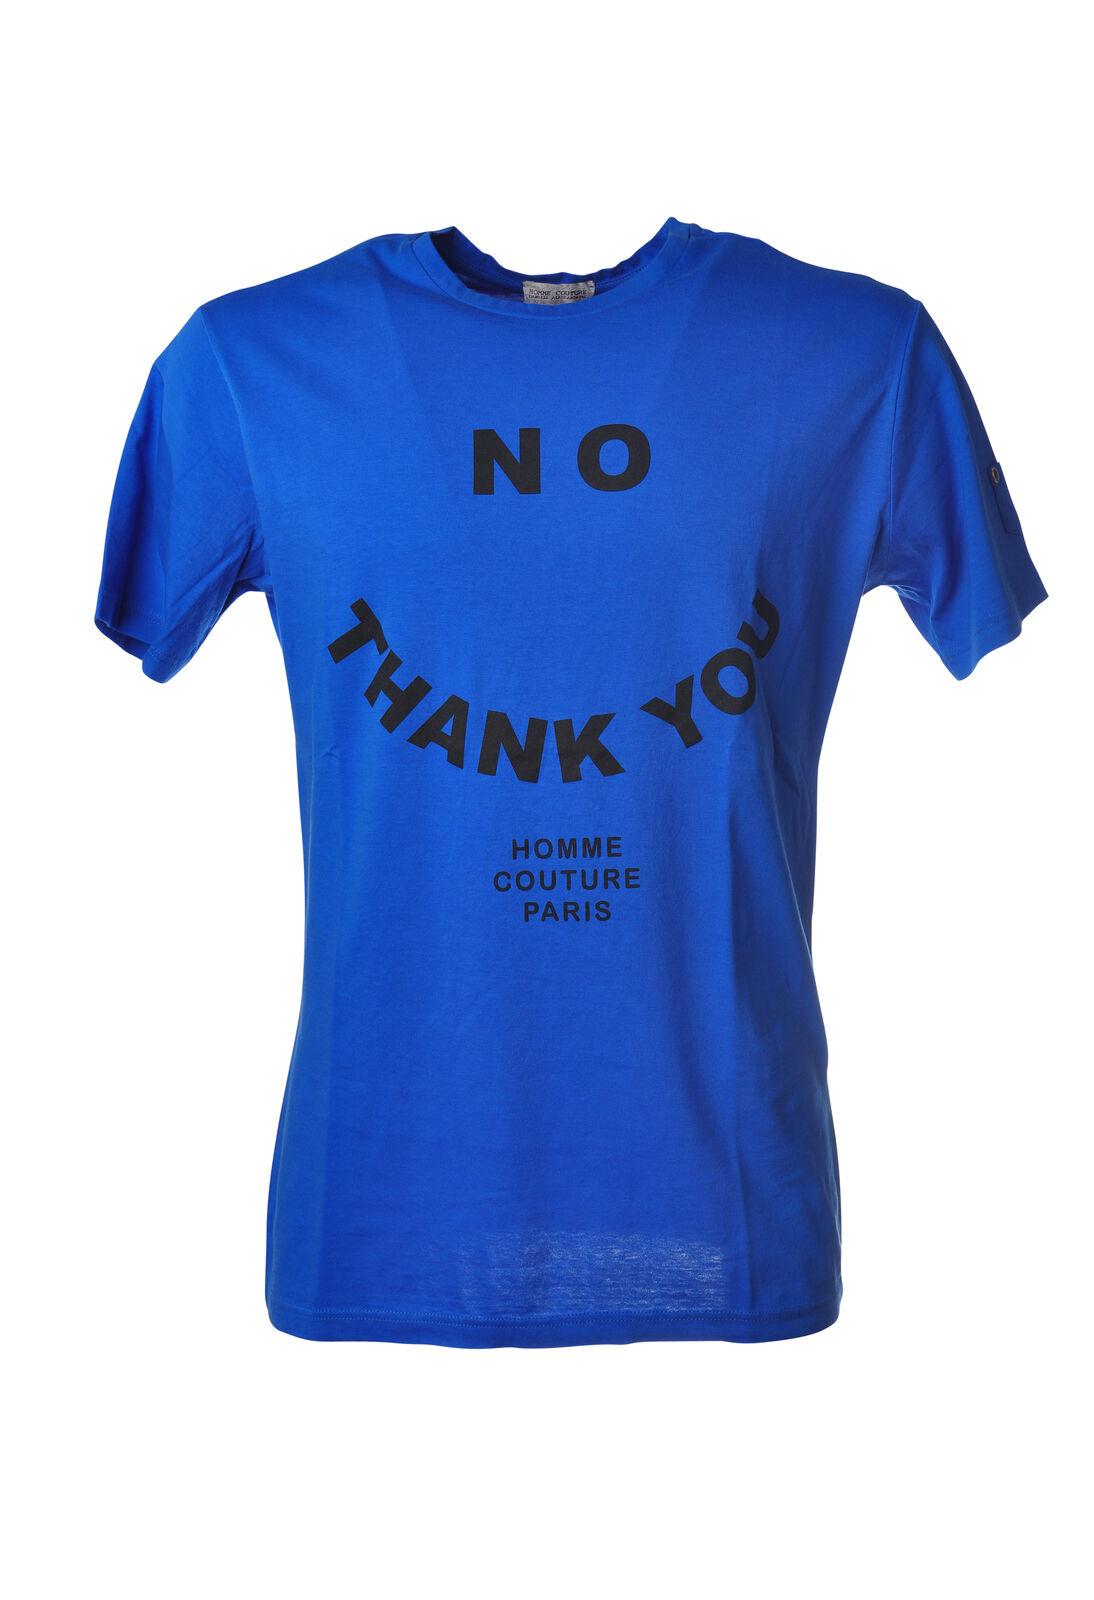 Daniele Alessandrini - Topwear-T-shirts - Man - Blau - 5290105G181940